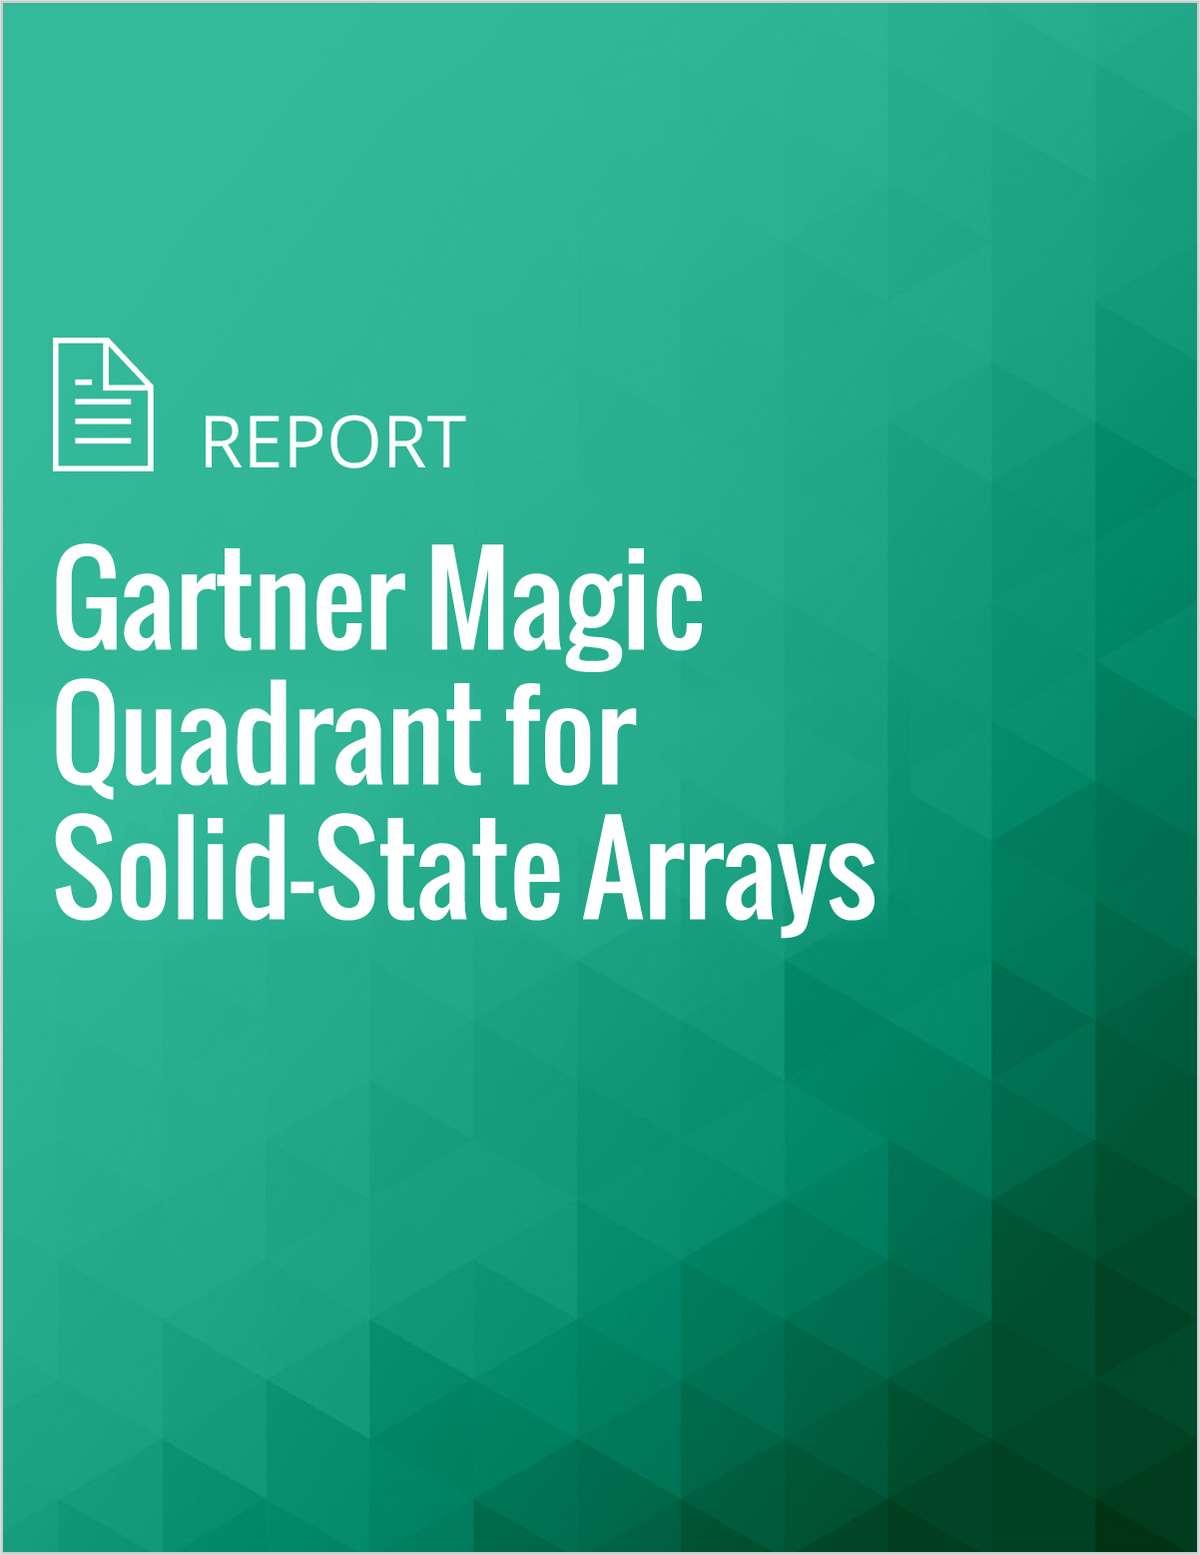 Gartner Magic Quadrant for Solid-State Arrays